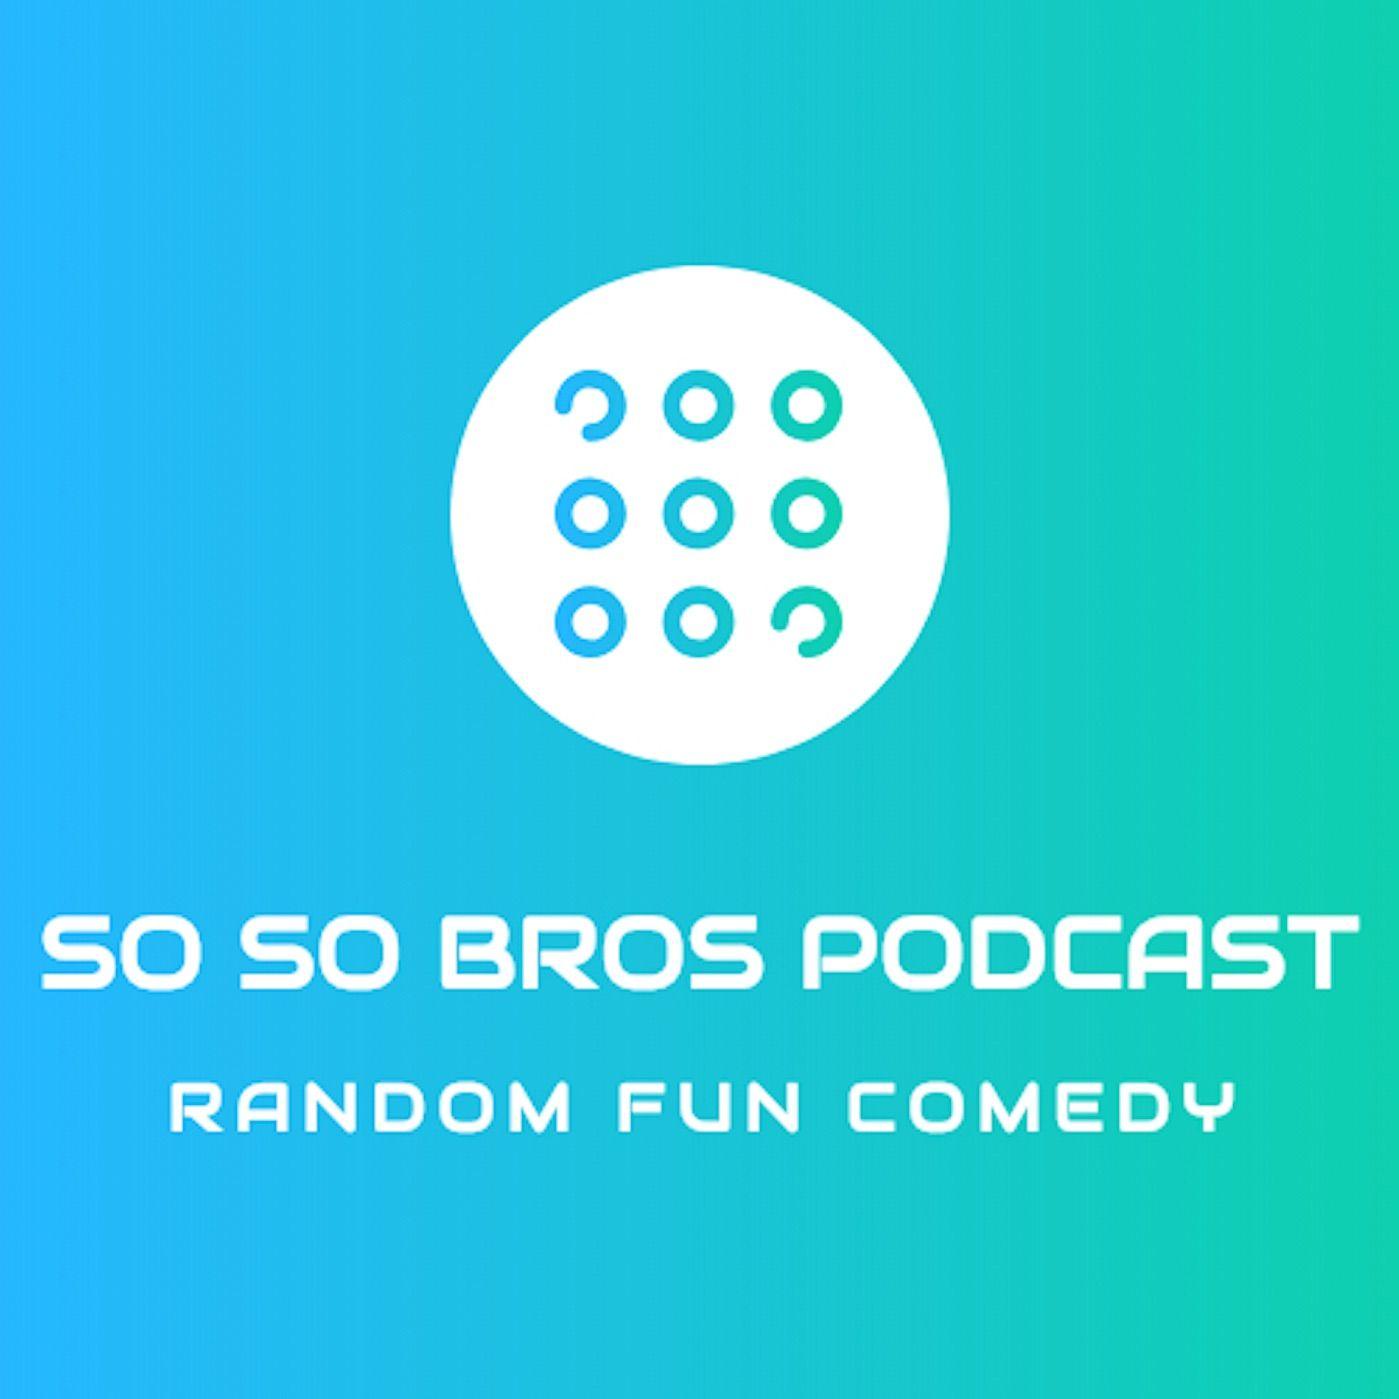 SoSo Bros Podcast 27- Love Episode part 2